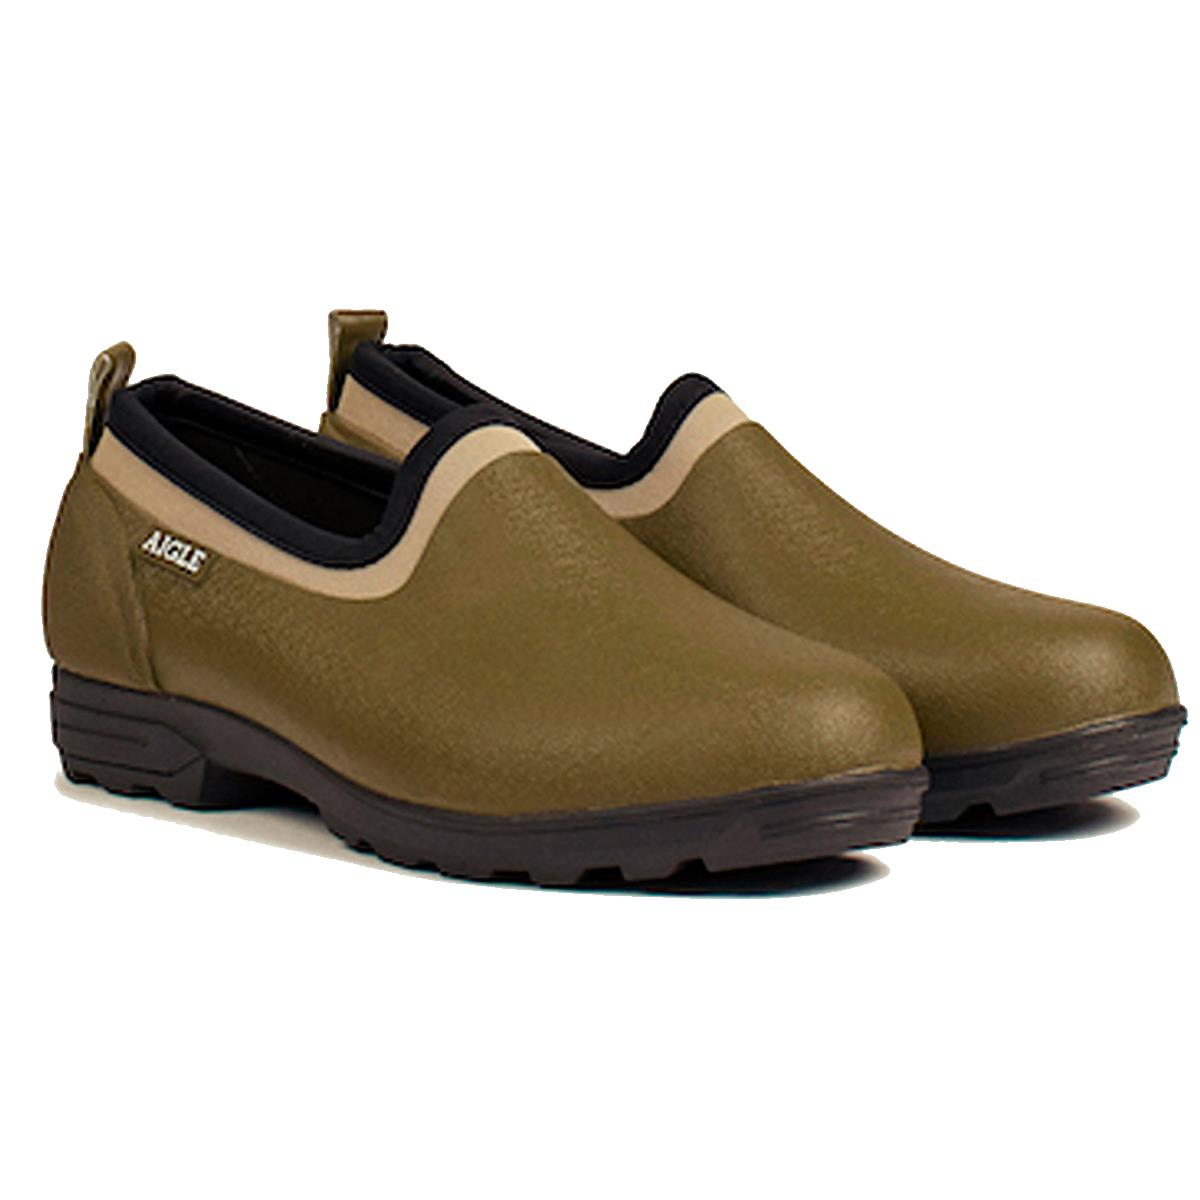 Aigle Unisex Lessfor Rubber Shoe Kaki 9.5 (EU44)